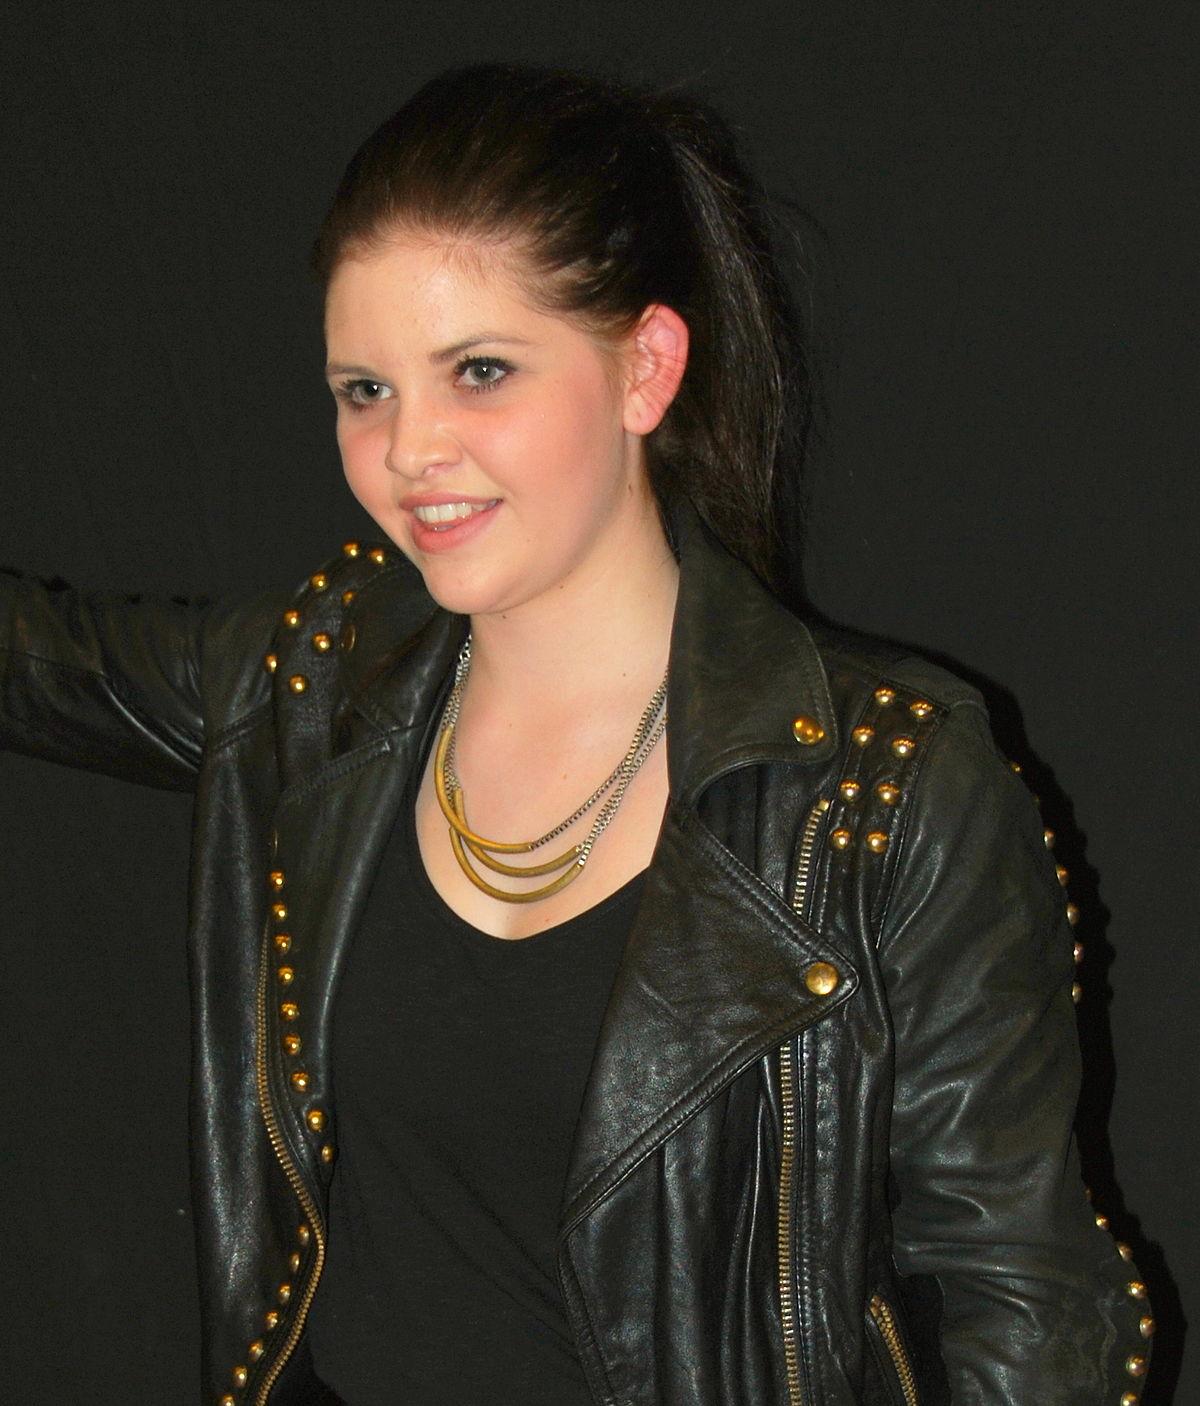 singler i danmark 2012 Aabenraa